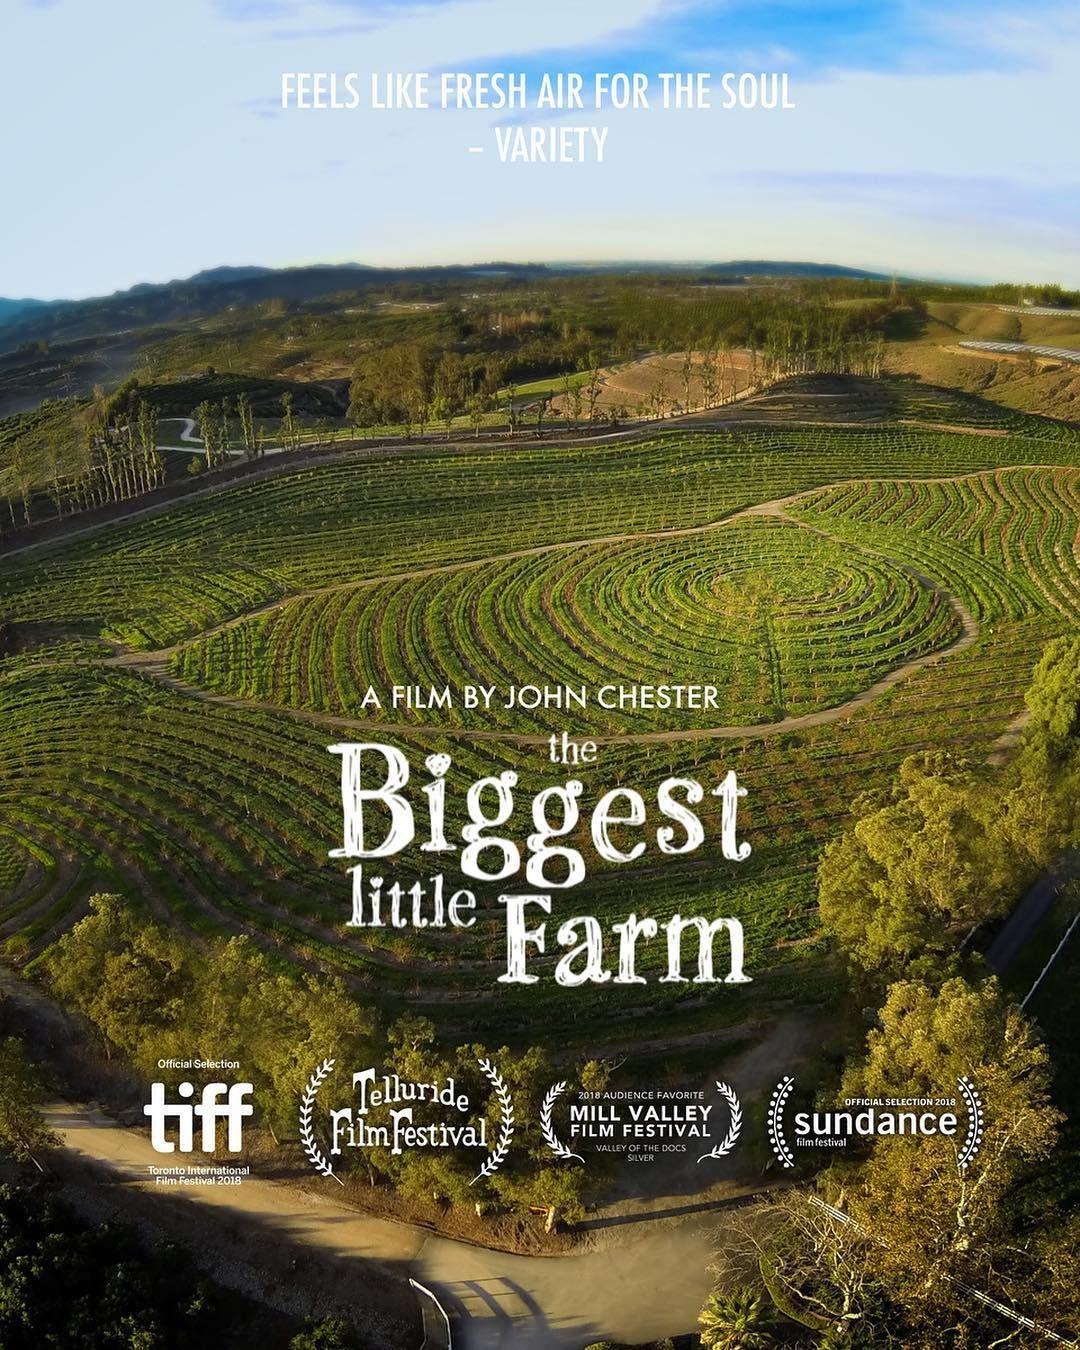 The Biggest Little Farm Big Little Good Movies Road Trip Usa